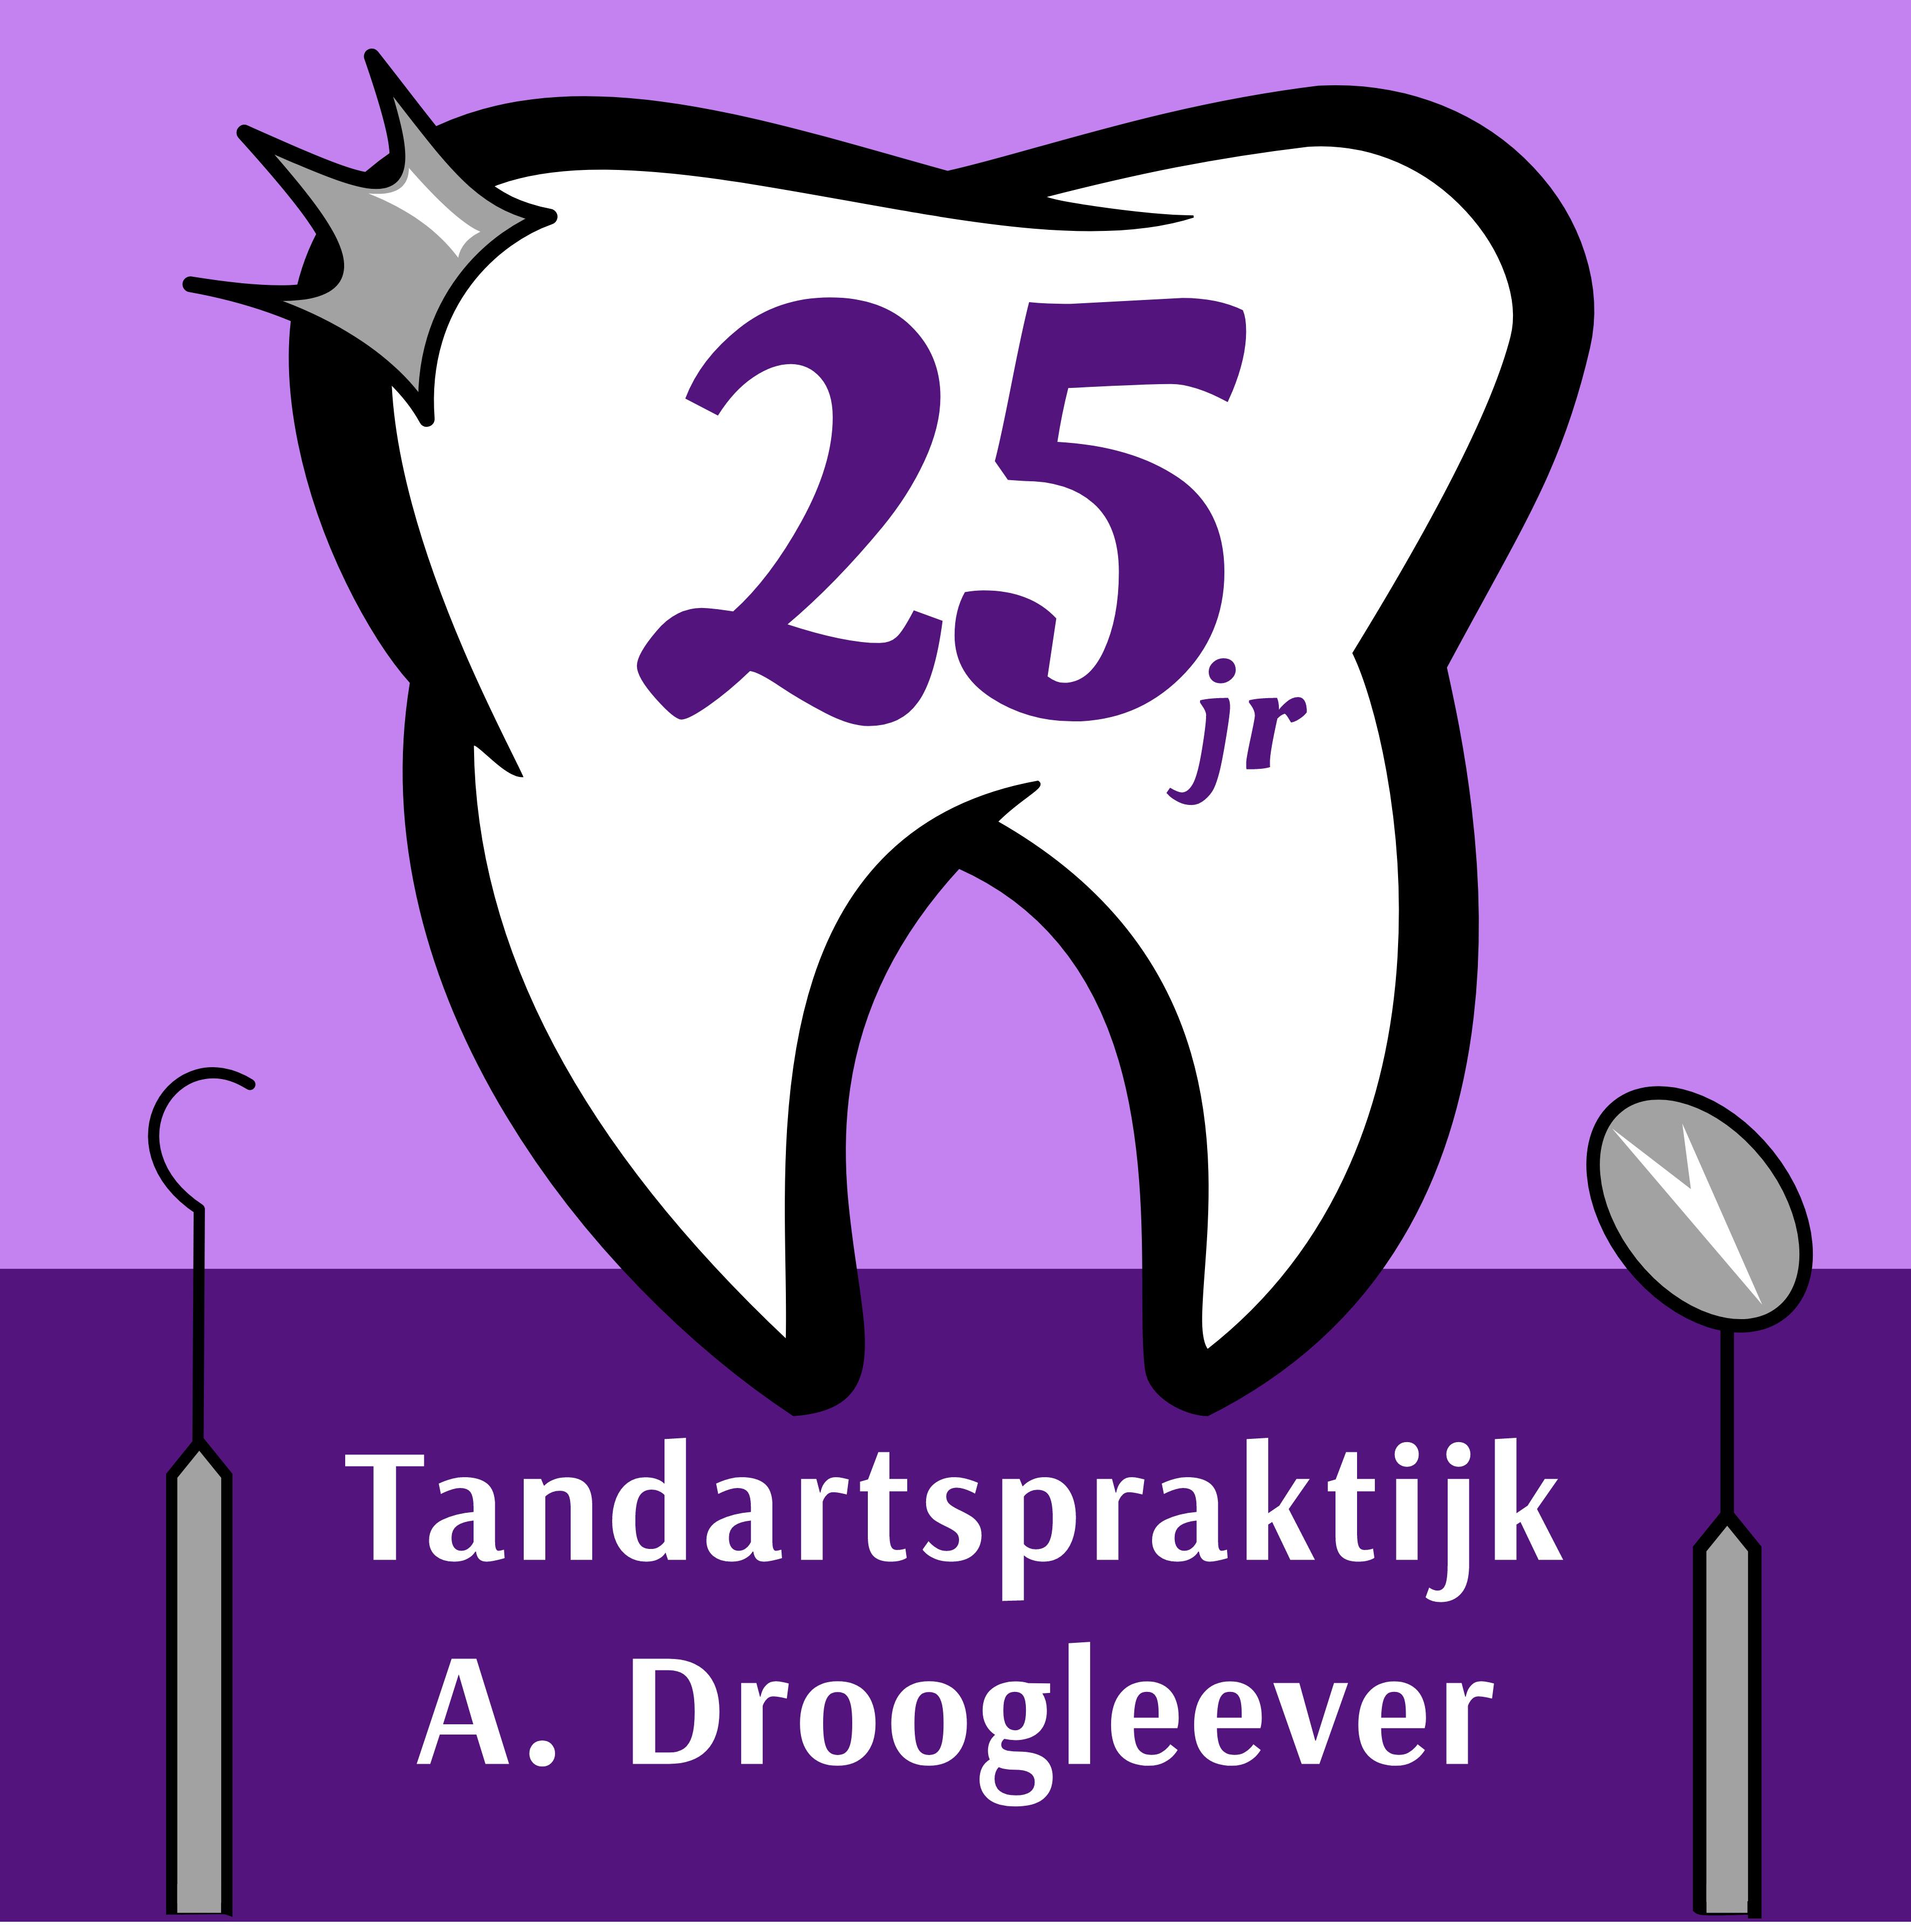 Tandartspraktijk Droogleever